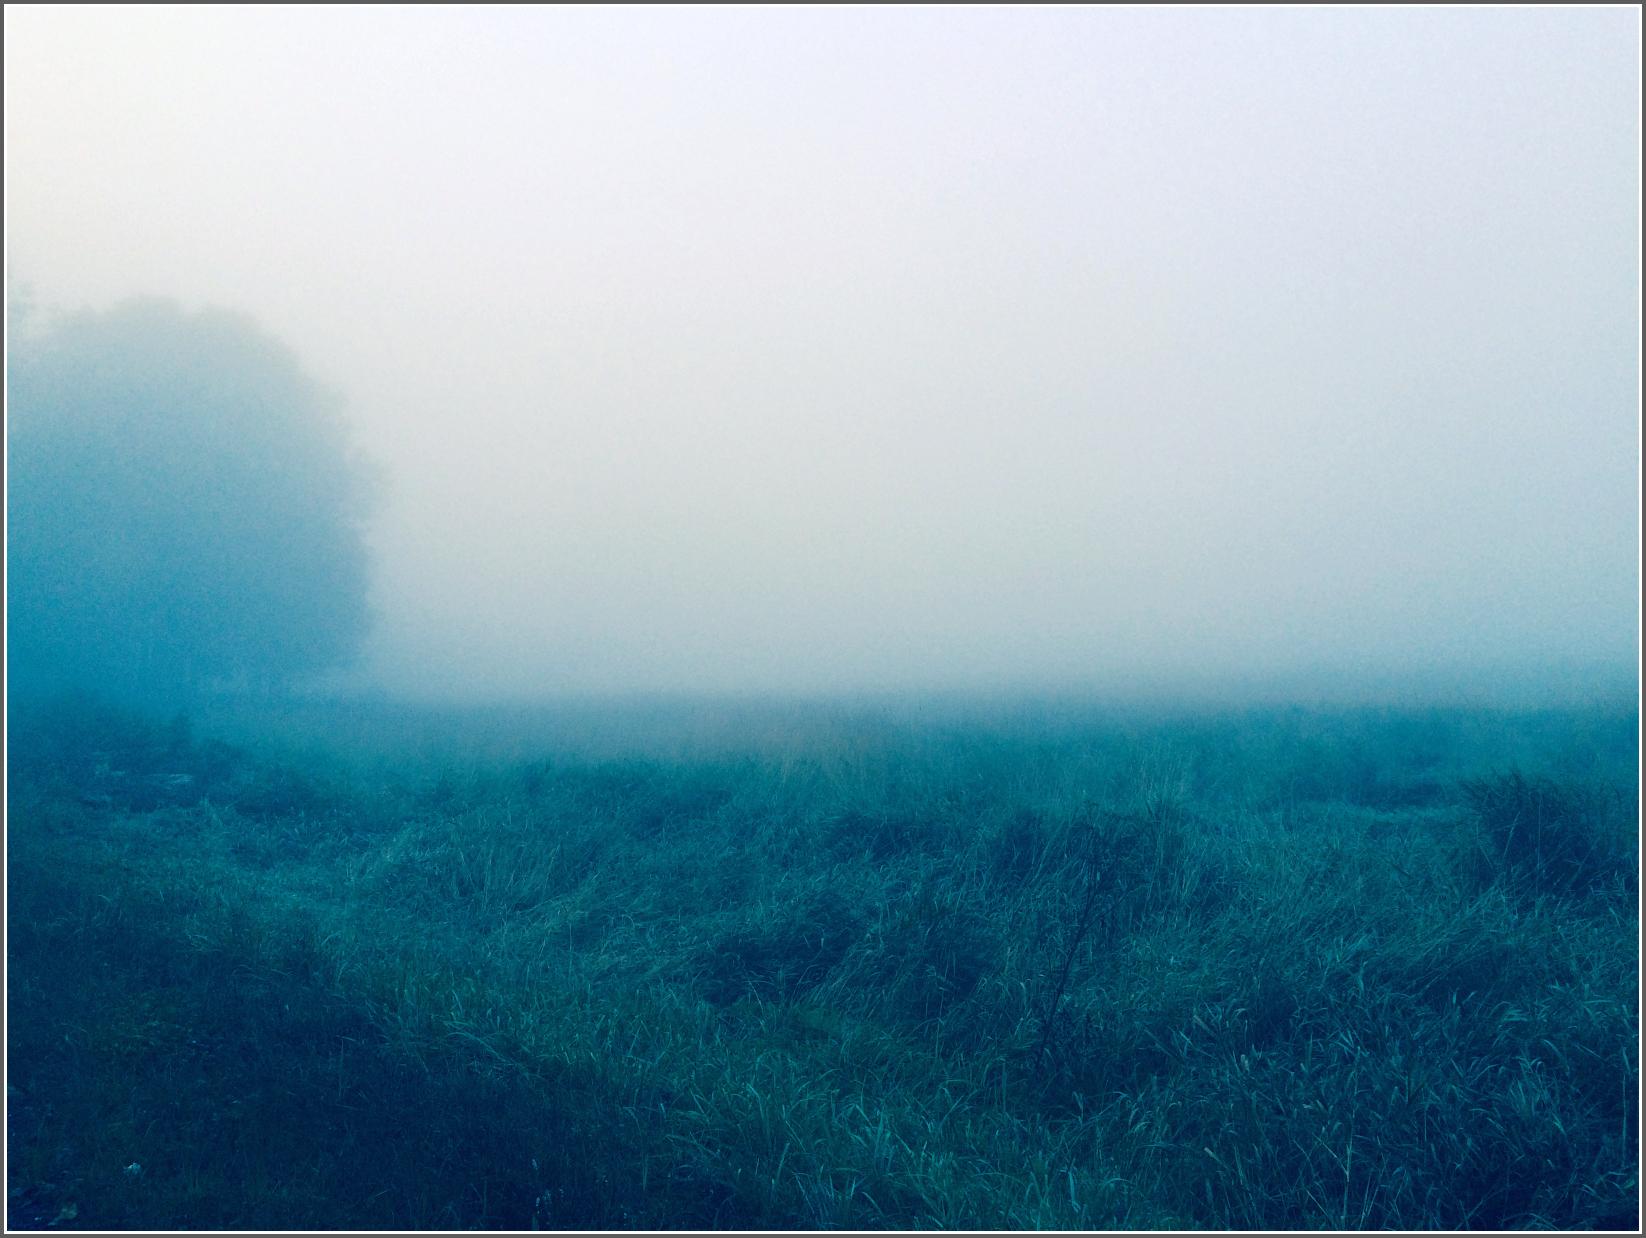 Hayfield in Morning Mist by Dena T BrayⒸ